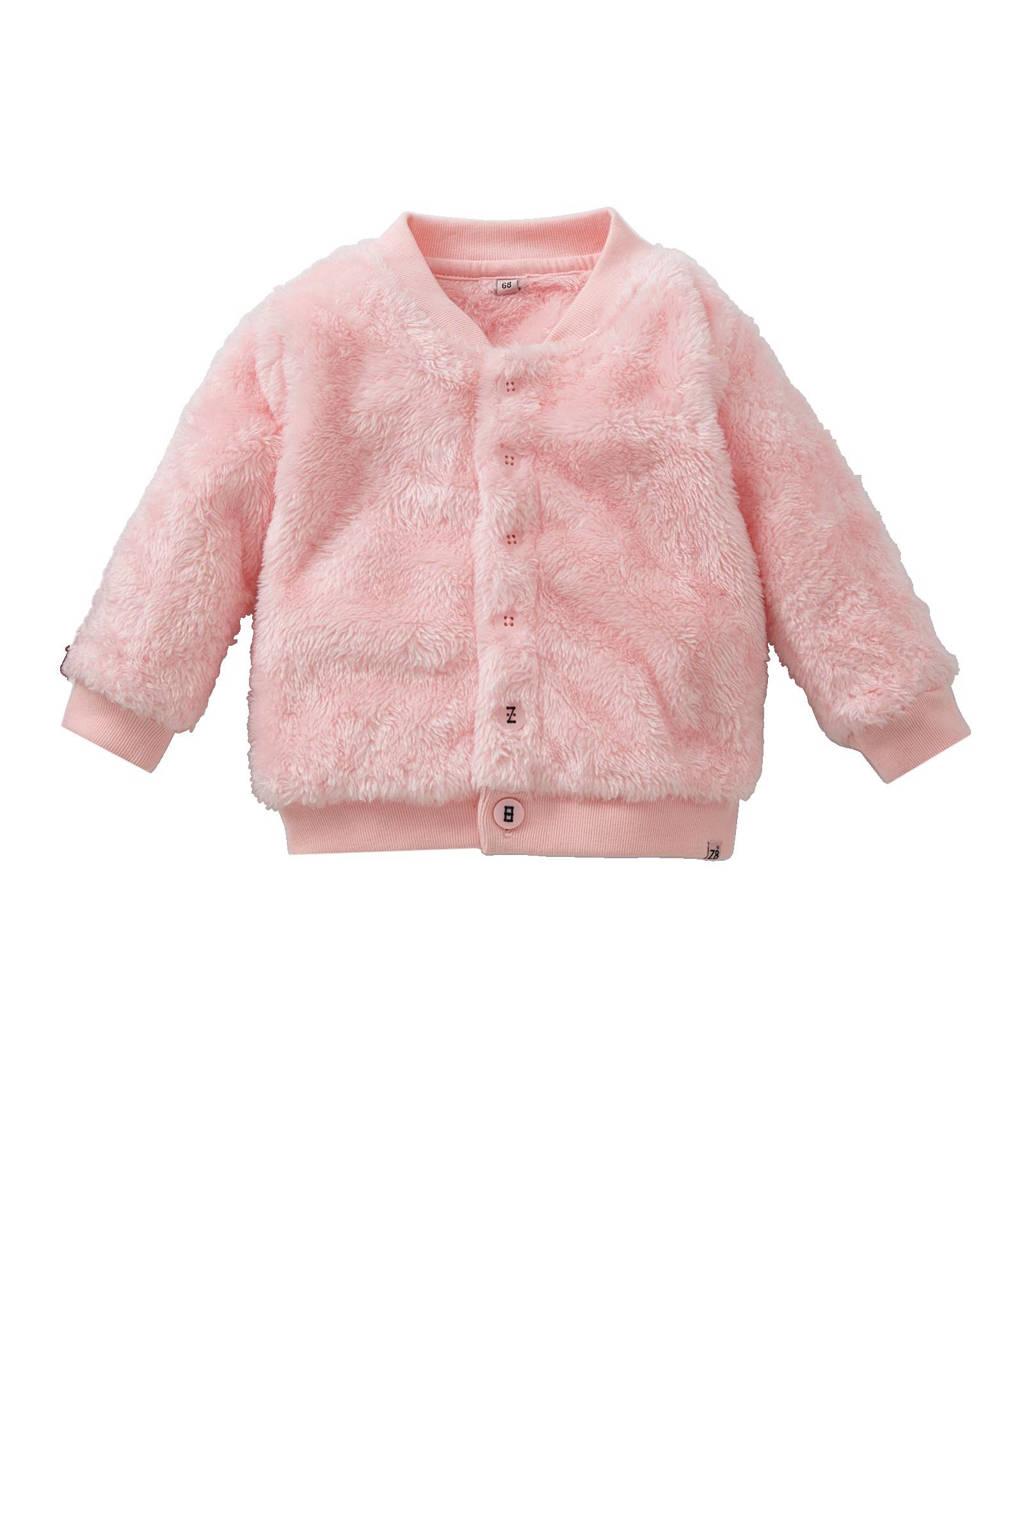 Z8 newborn baby vest Limestone, Roze